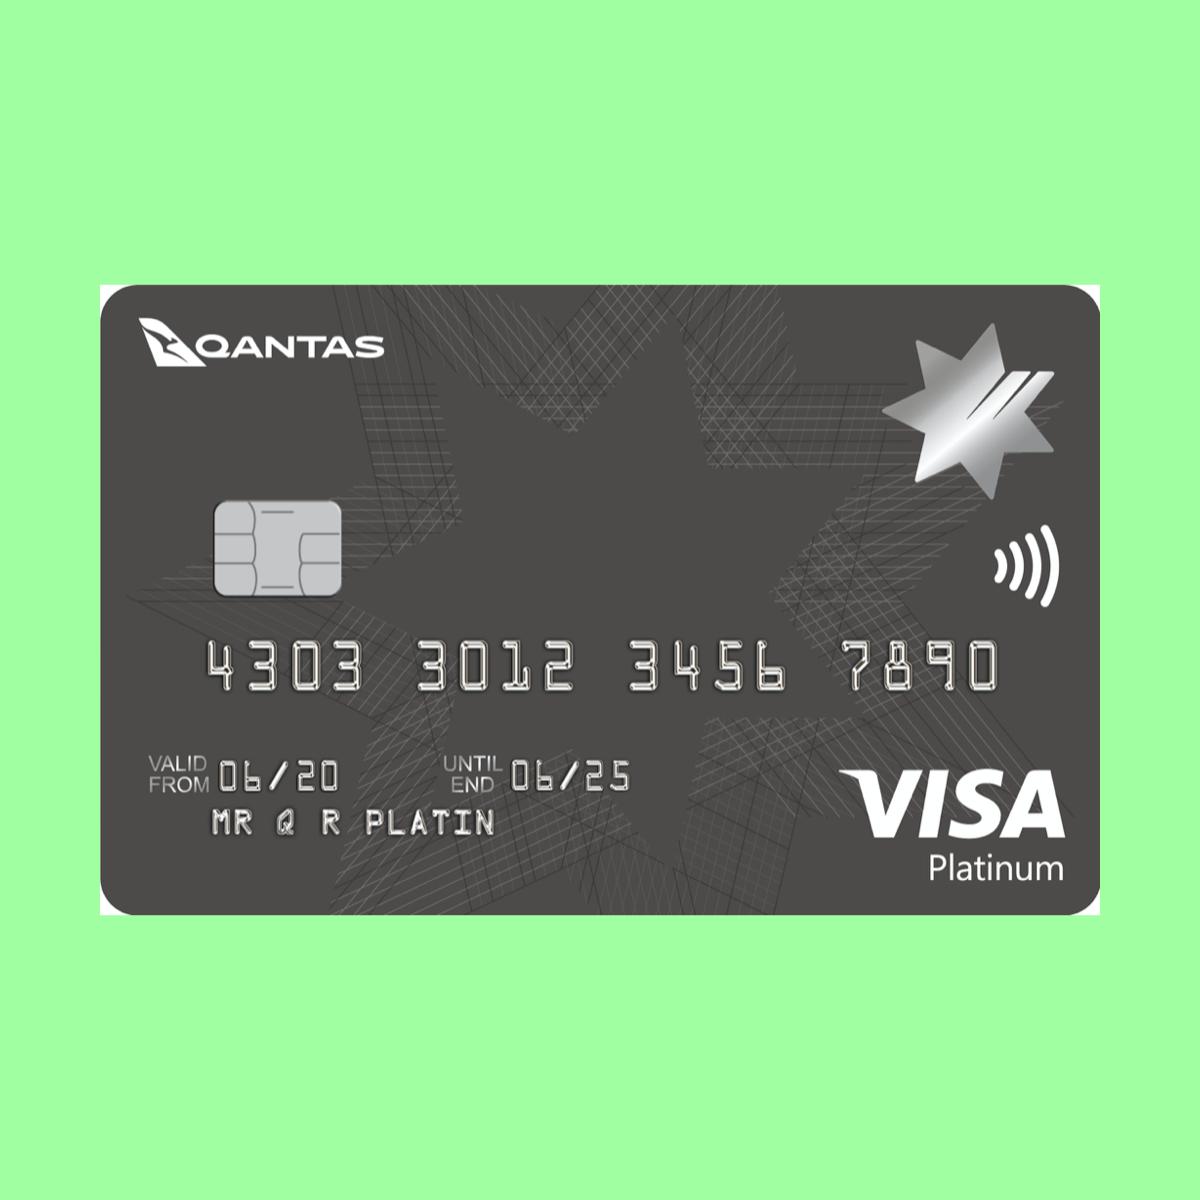 Nab Qantas Rewards Premium Card The Point Calculator Reward Card Bonus Cash Family Cards